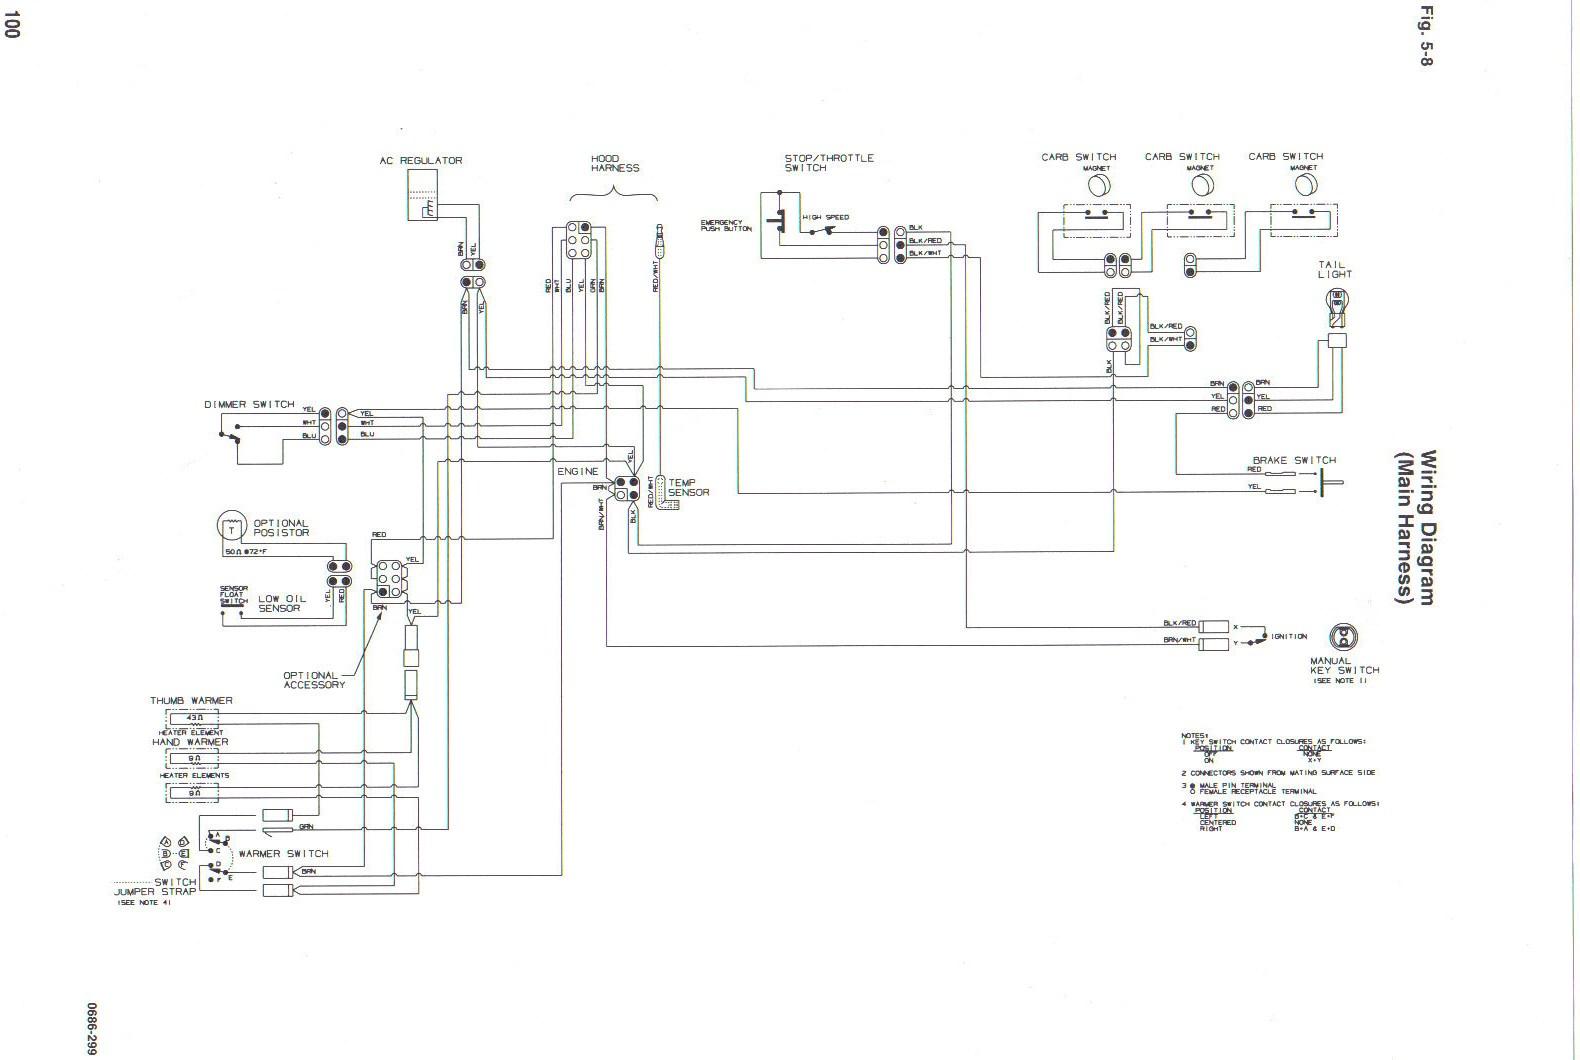 xtreme 90cc atv wiring diagram cz 4743  yamaha 250 atv wiring schematics download diagram  yamaha 250 atv wiring schematics